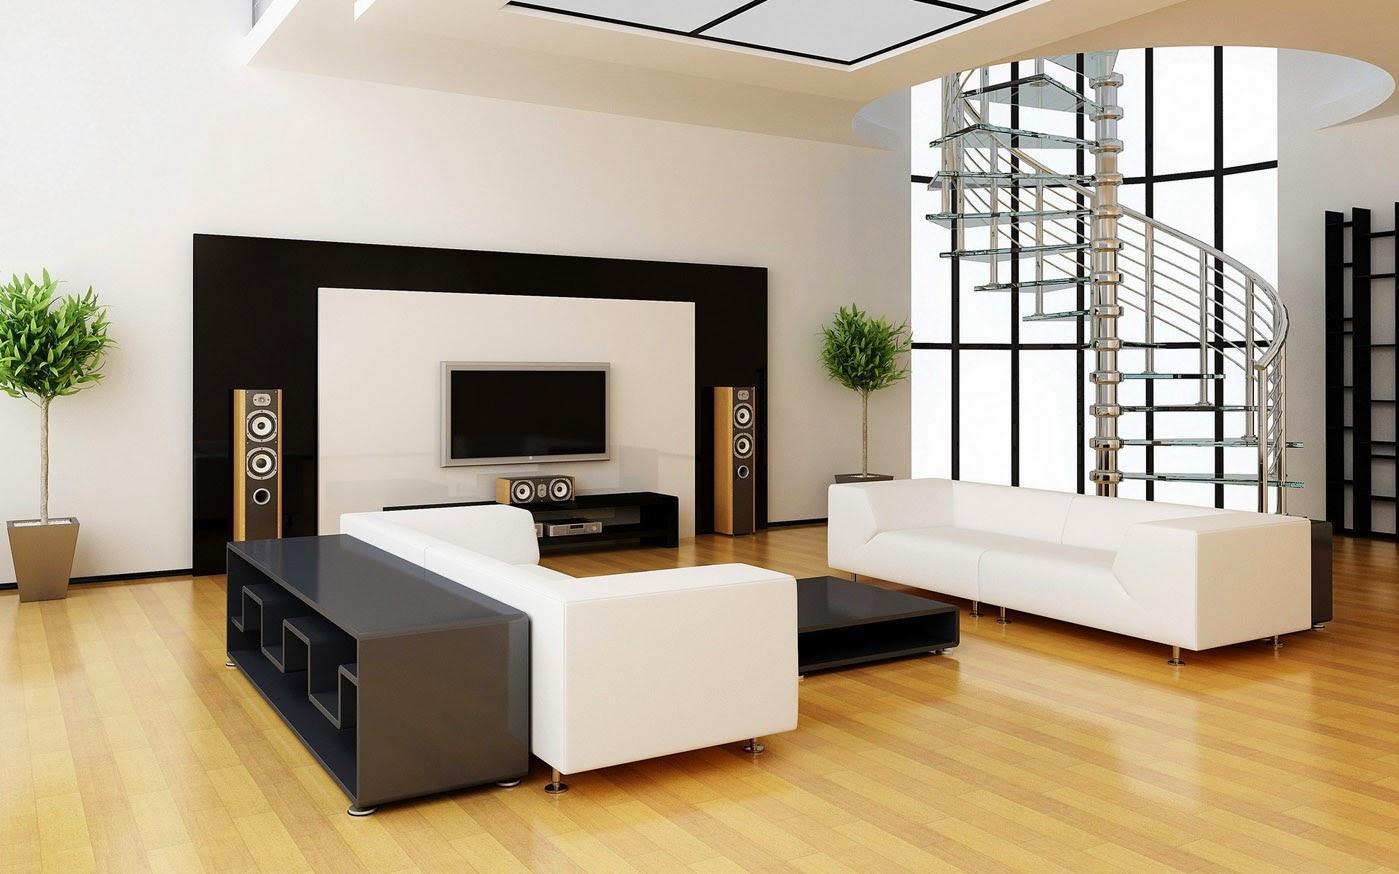 Apartment Interior Design Chennai fine apartment interior design chennai apartments small room